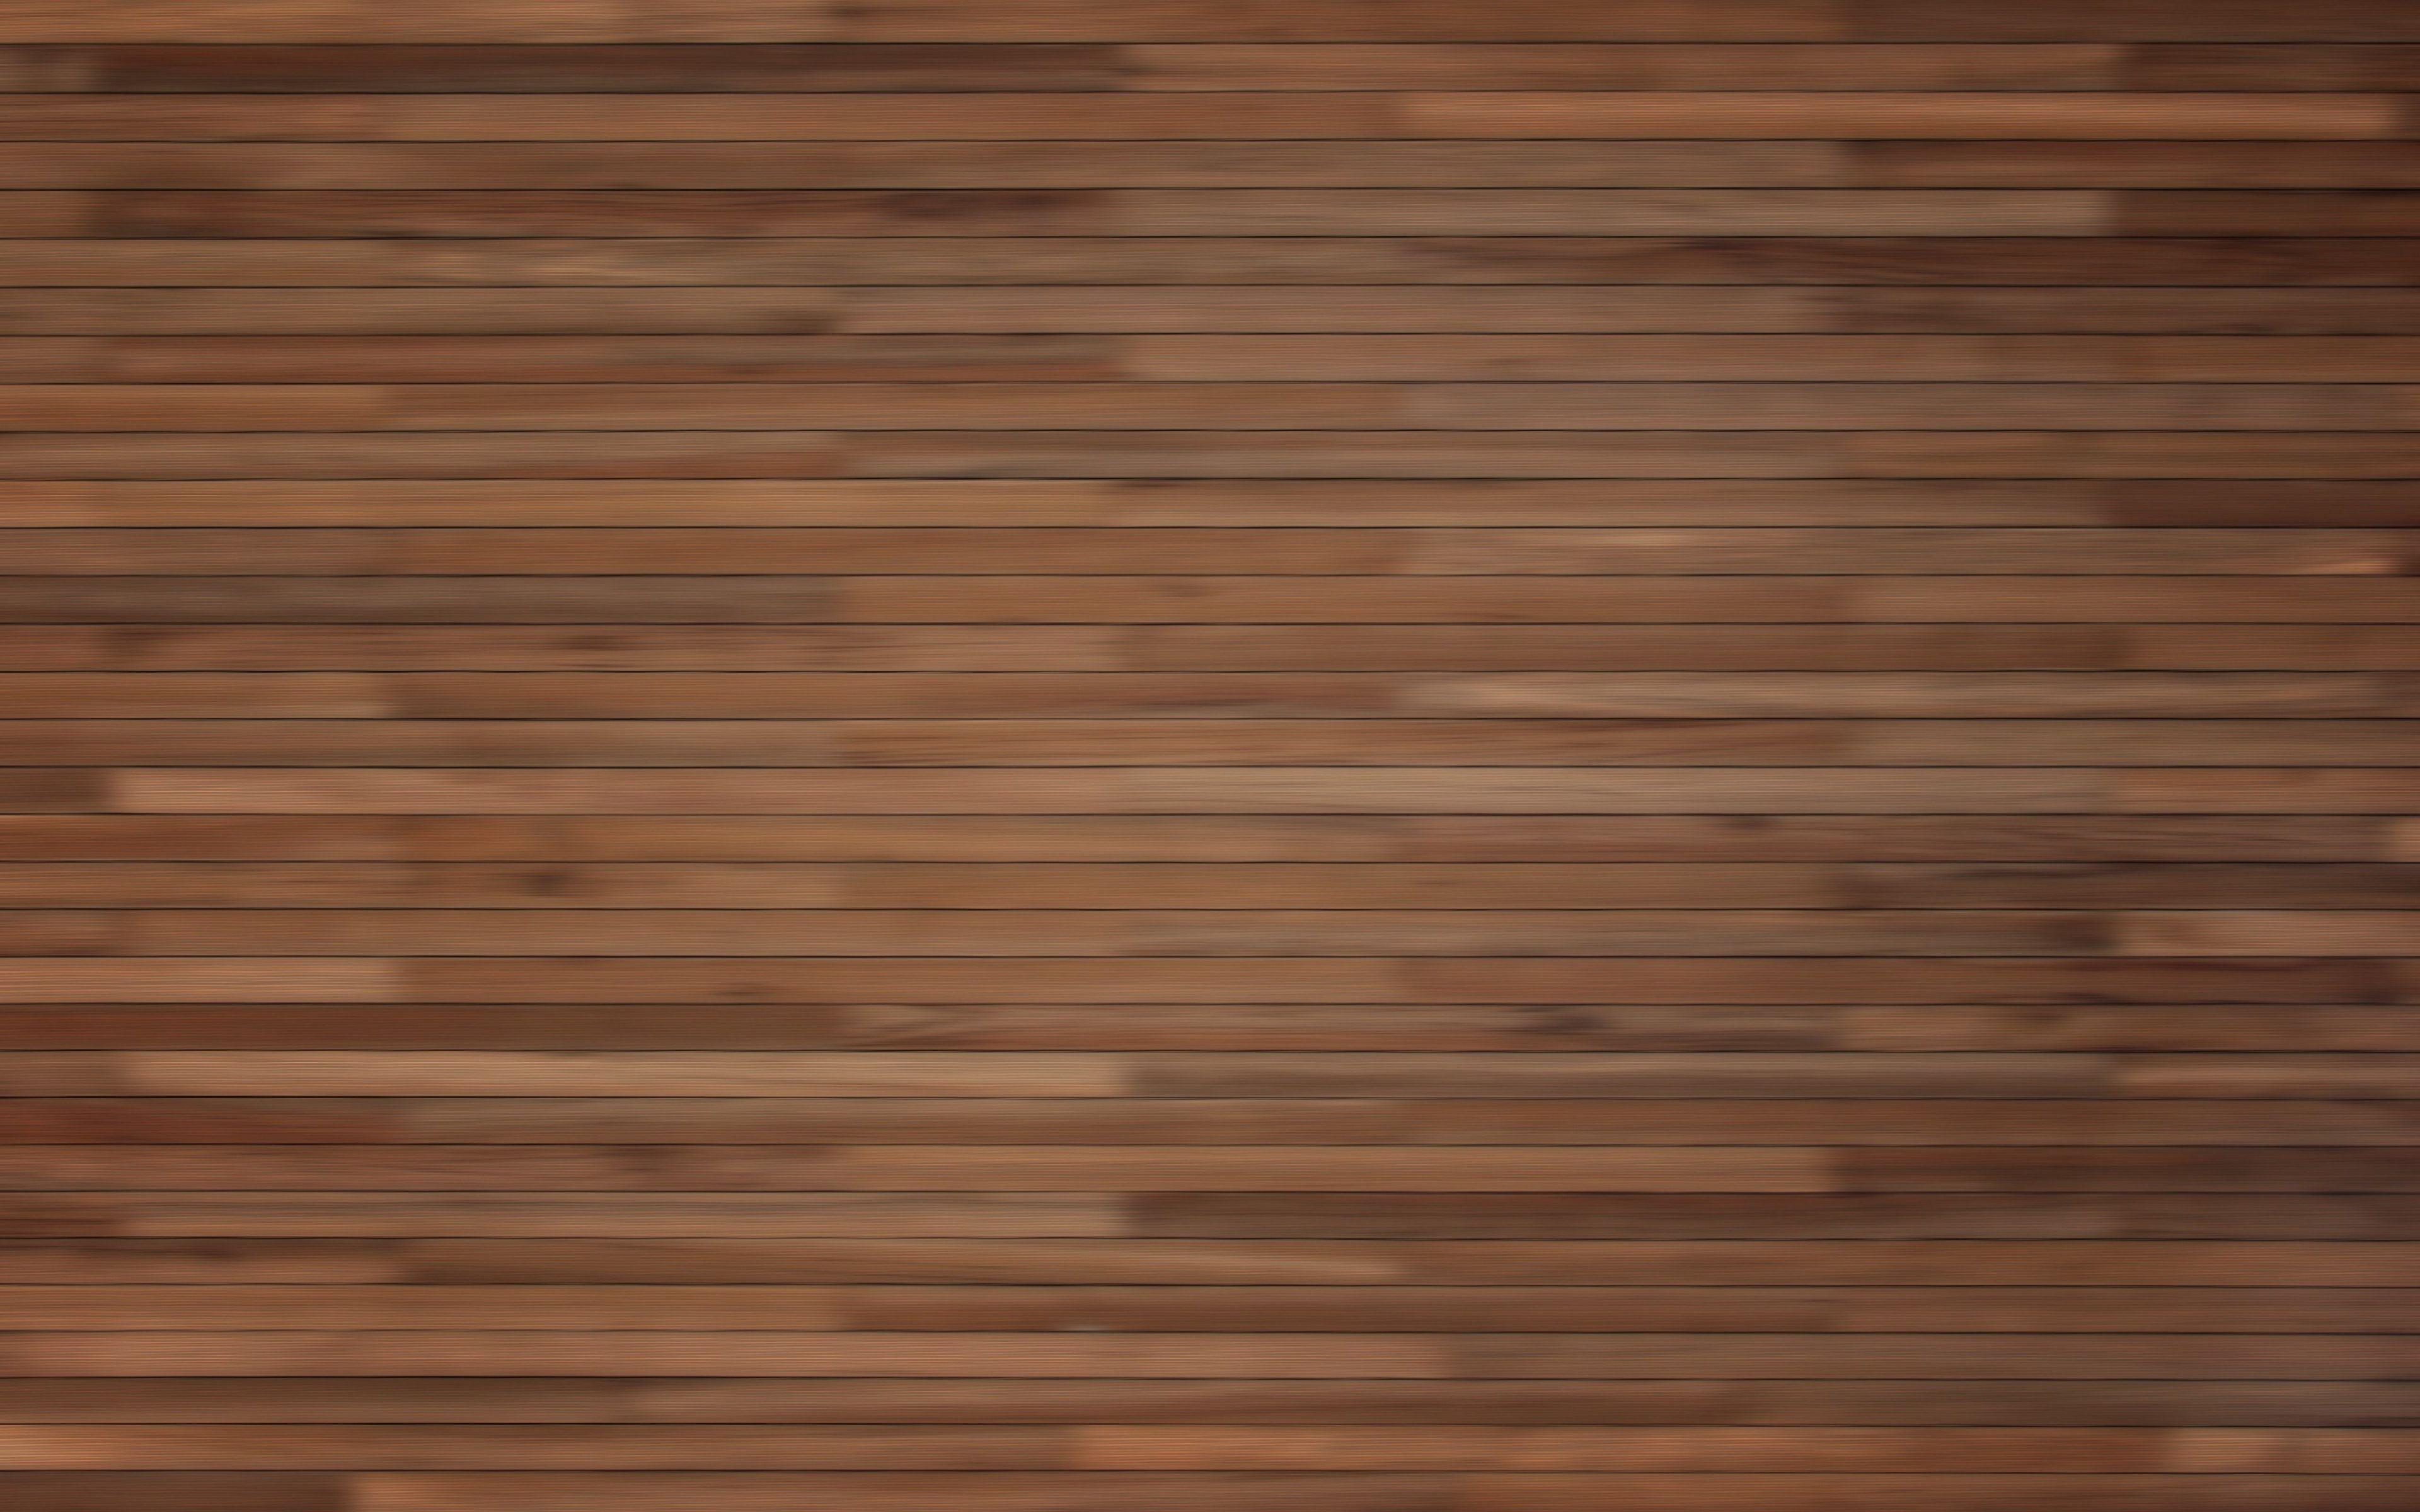 Ultra hd k wood wallpapers hd desktop backgrounds x 3d ultra hd k wood wallpapers hd desktop backgrounds x voltagebd Choice Image